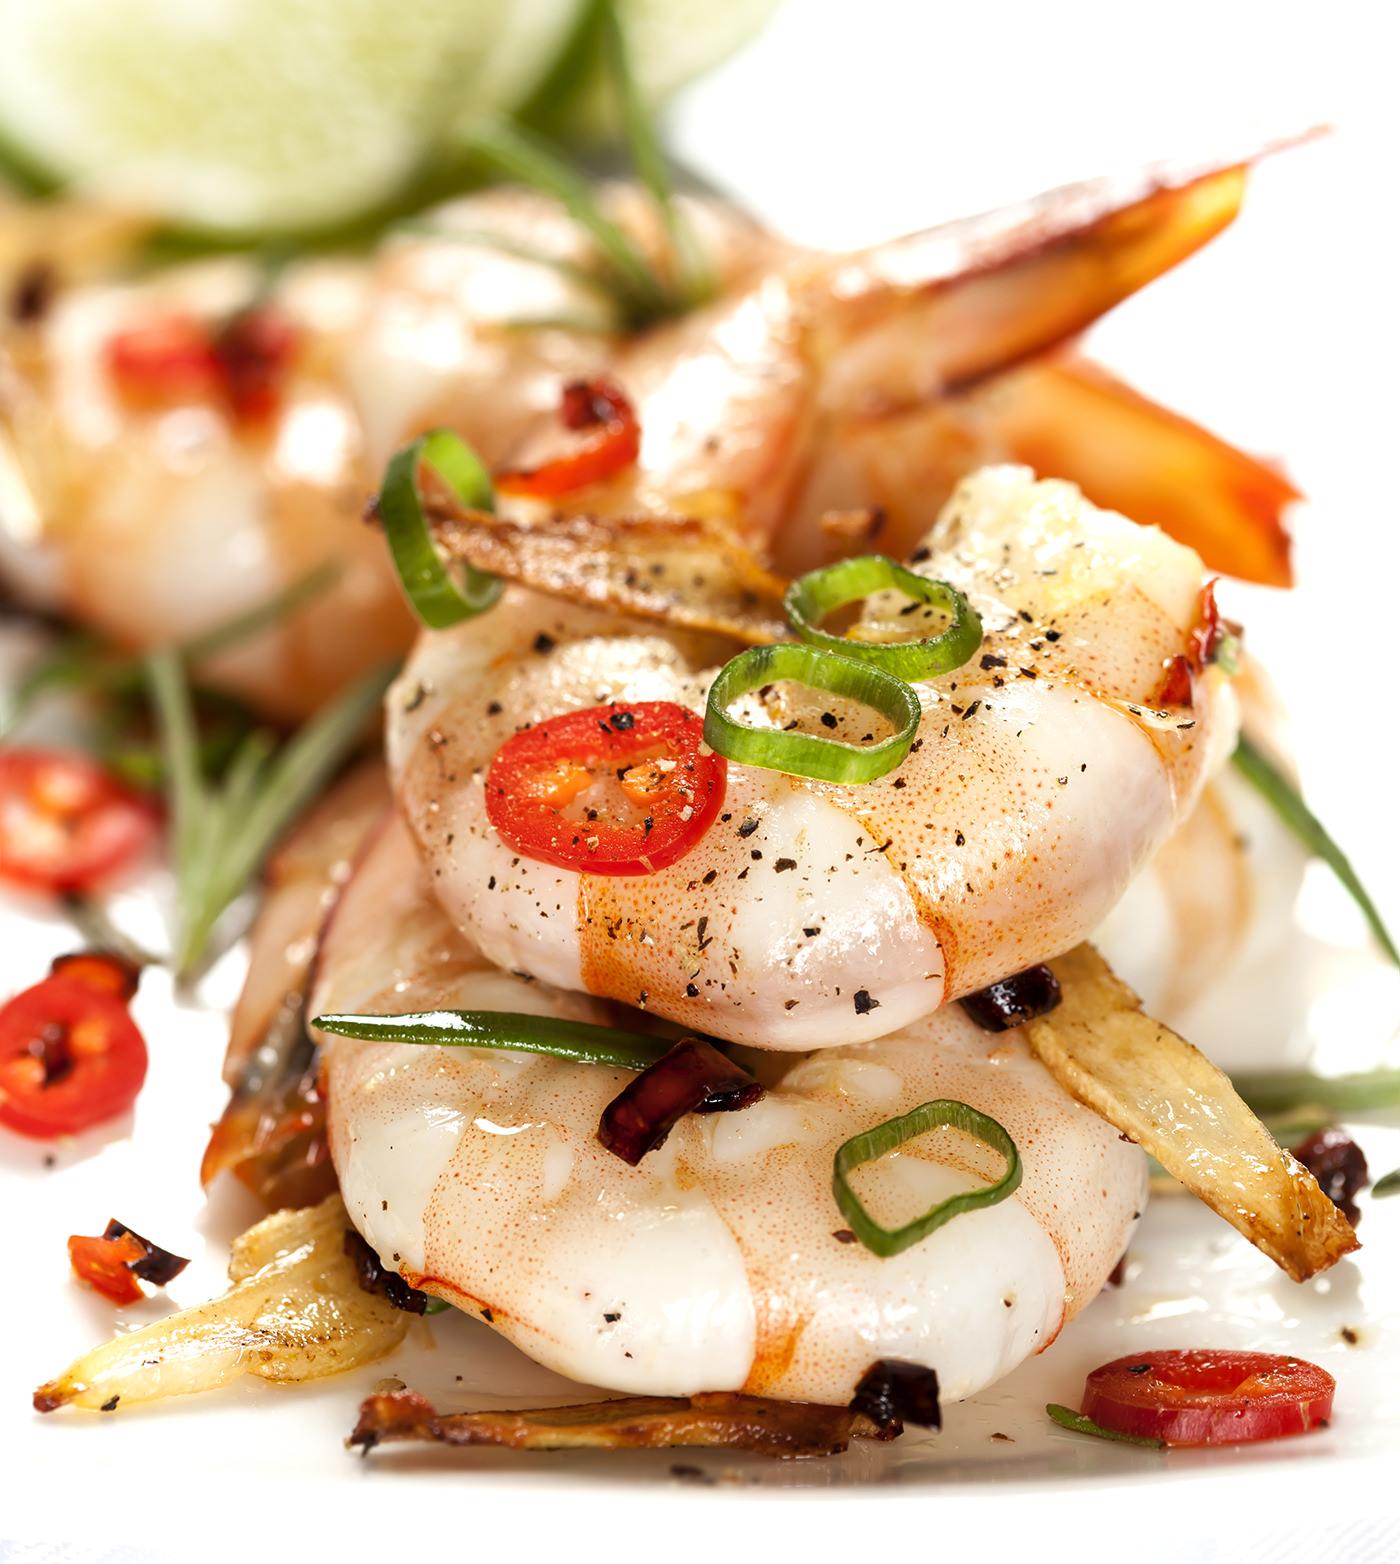 Garlic prawns garnished with red chili.